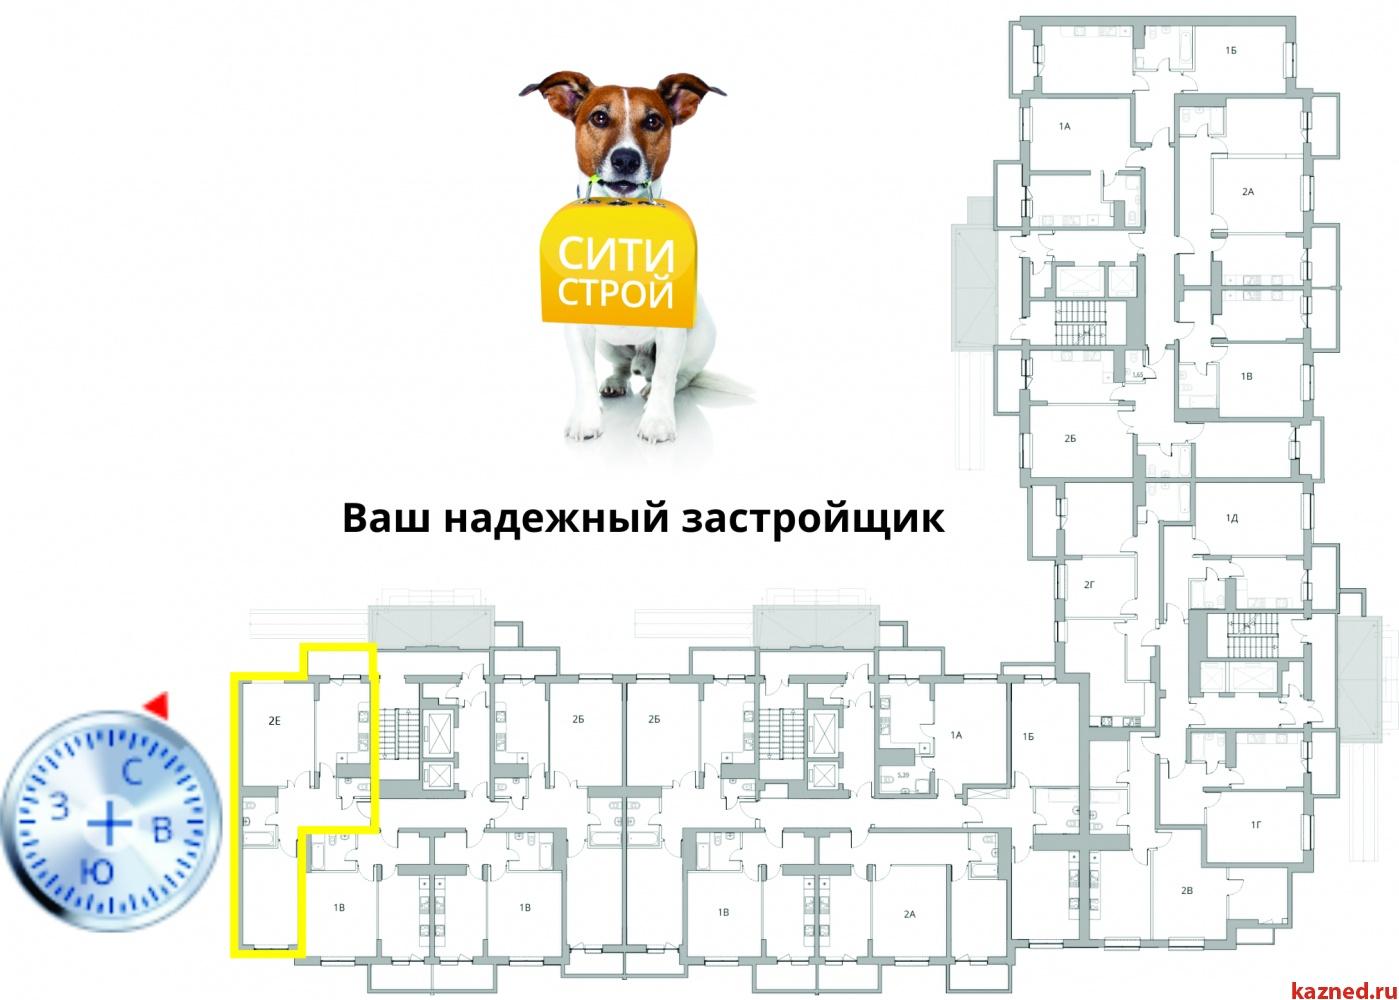 Продам 2-комн.квартиру Камая 8, 1 очередь, 71 м2  (миниатюра №2)